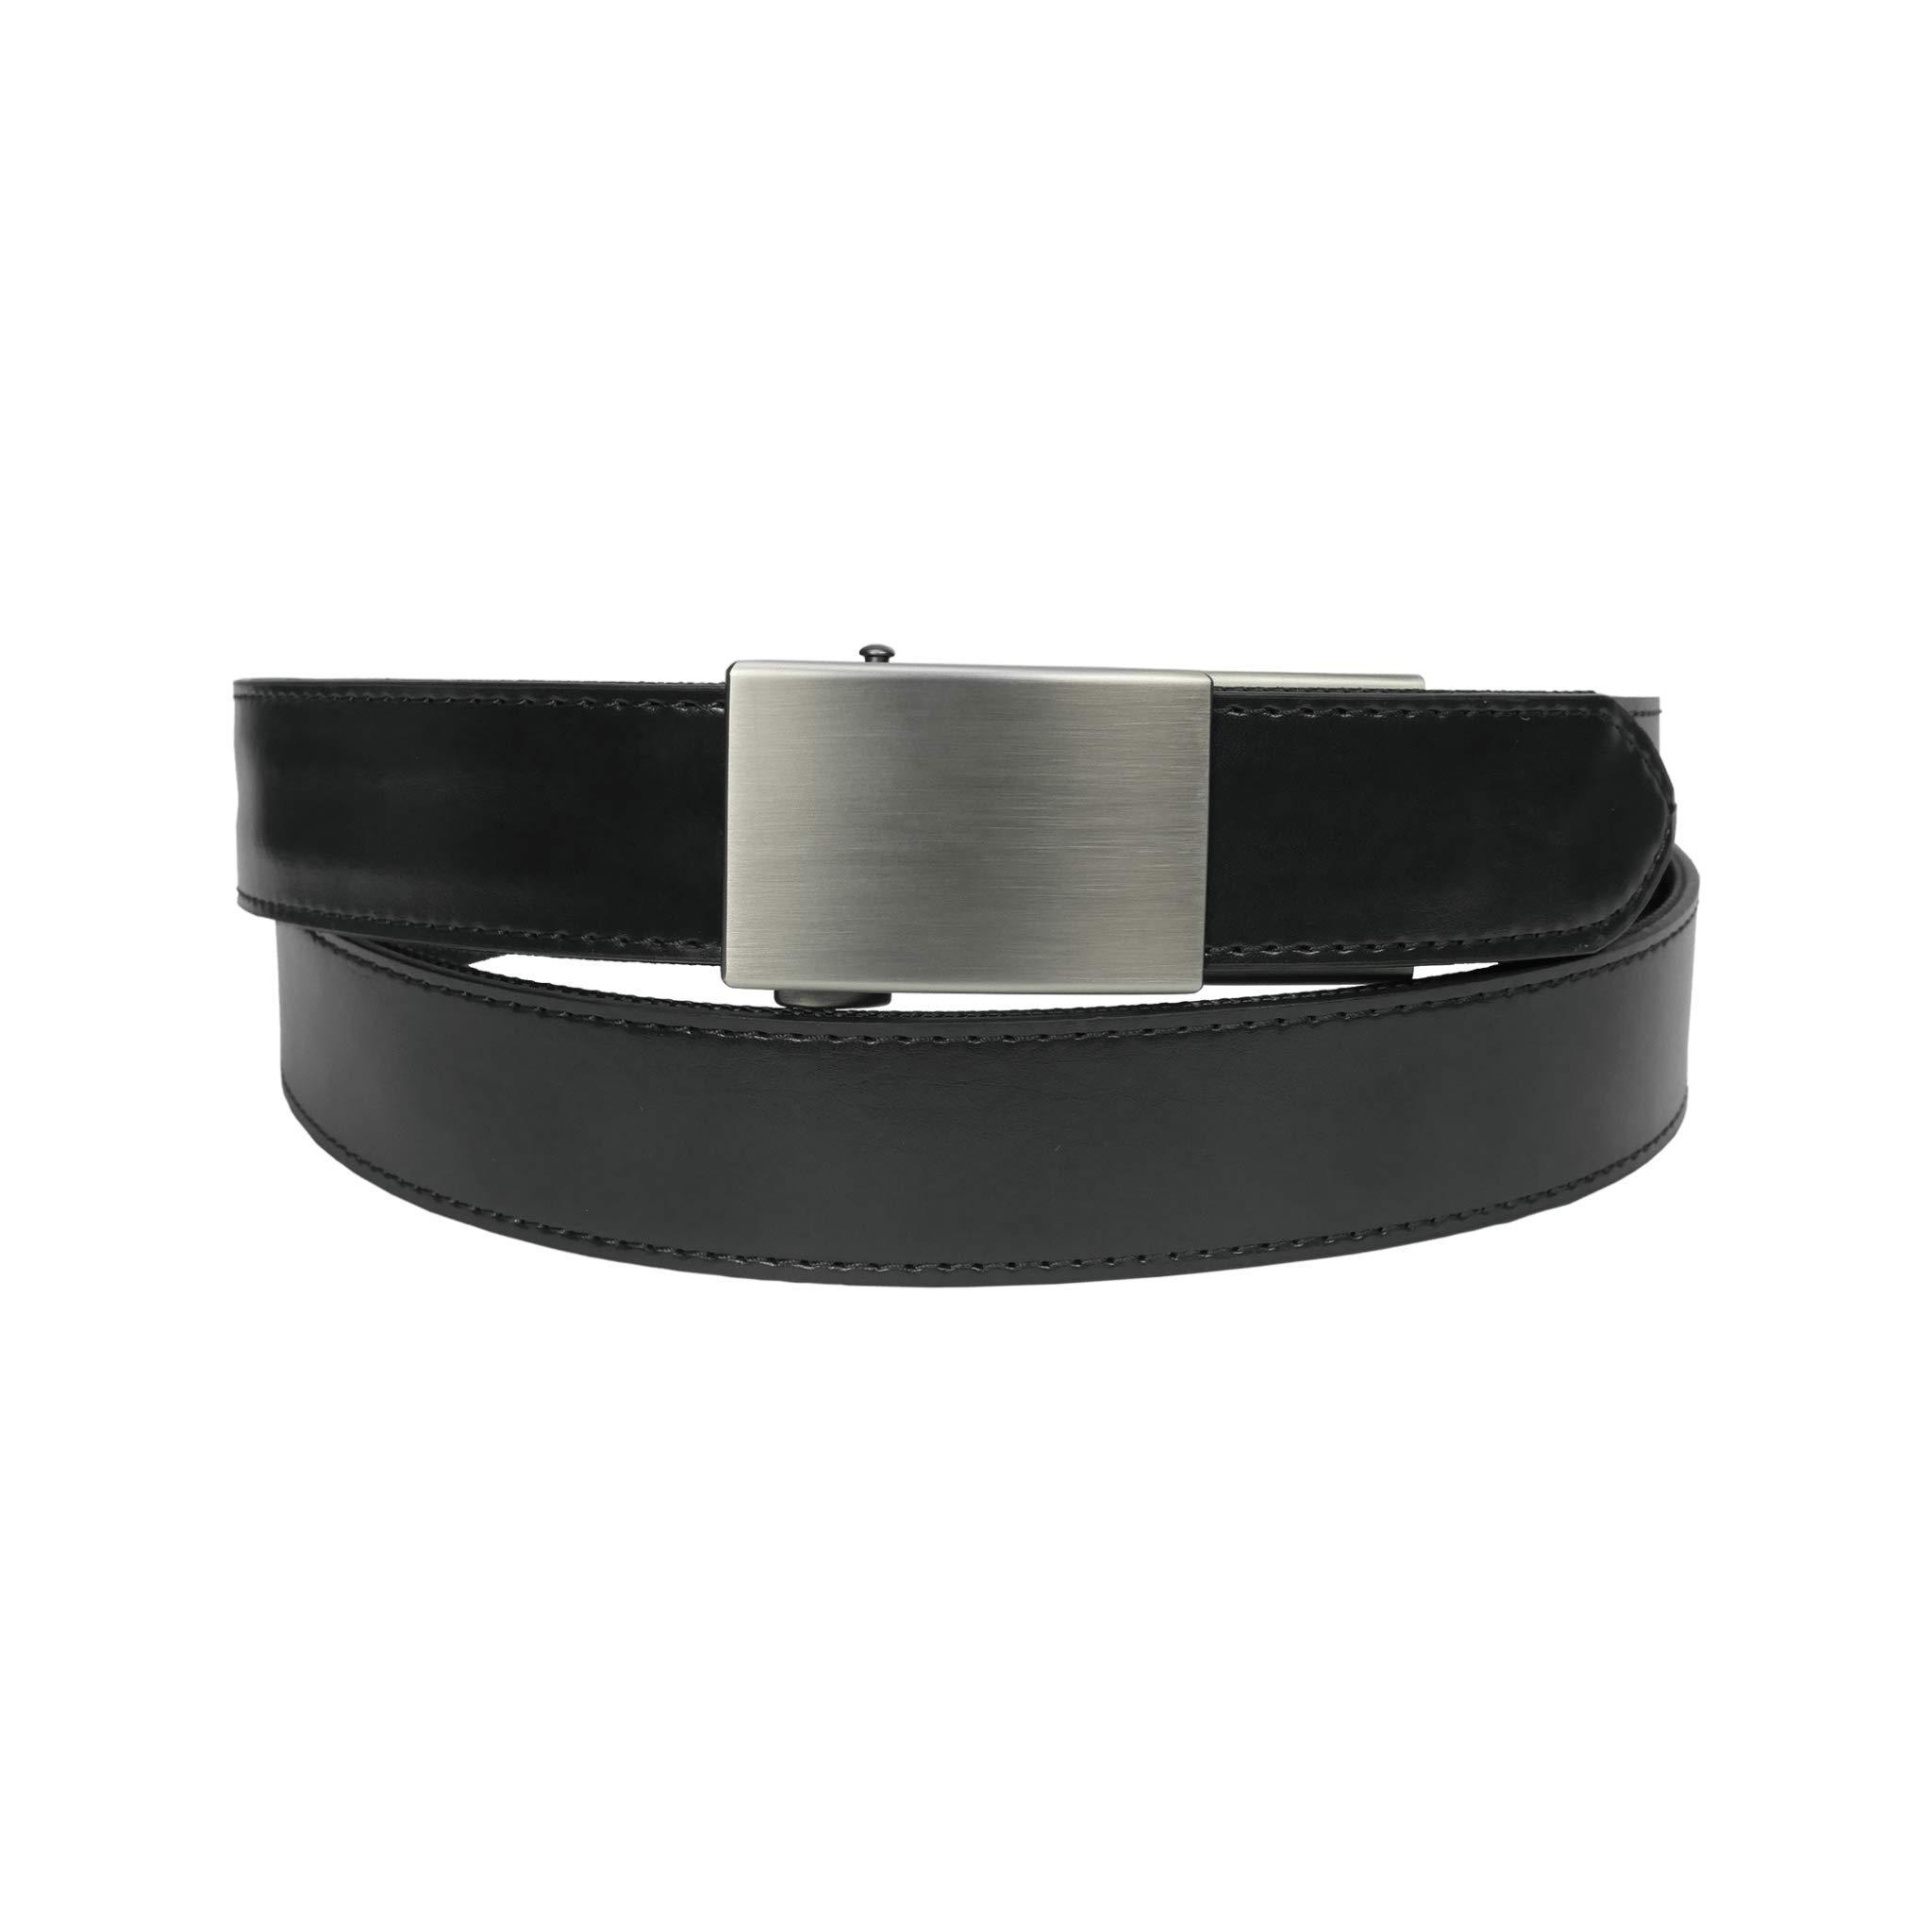 Blade-Tech - Ultimate Carry Belt (Black/Leather)